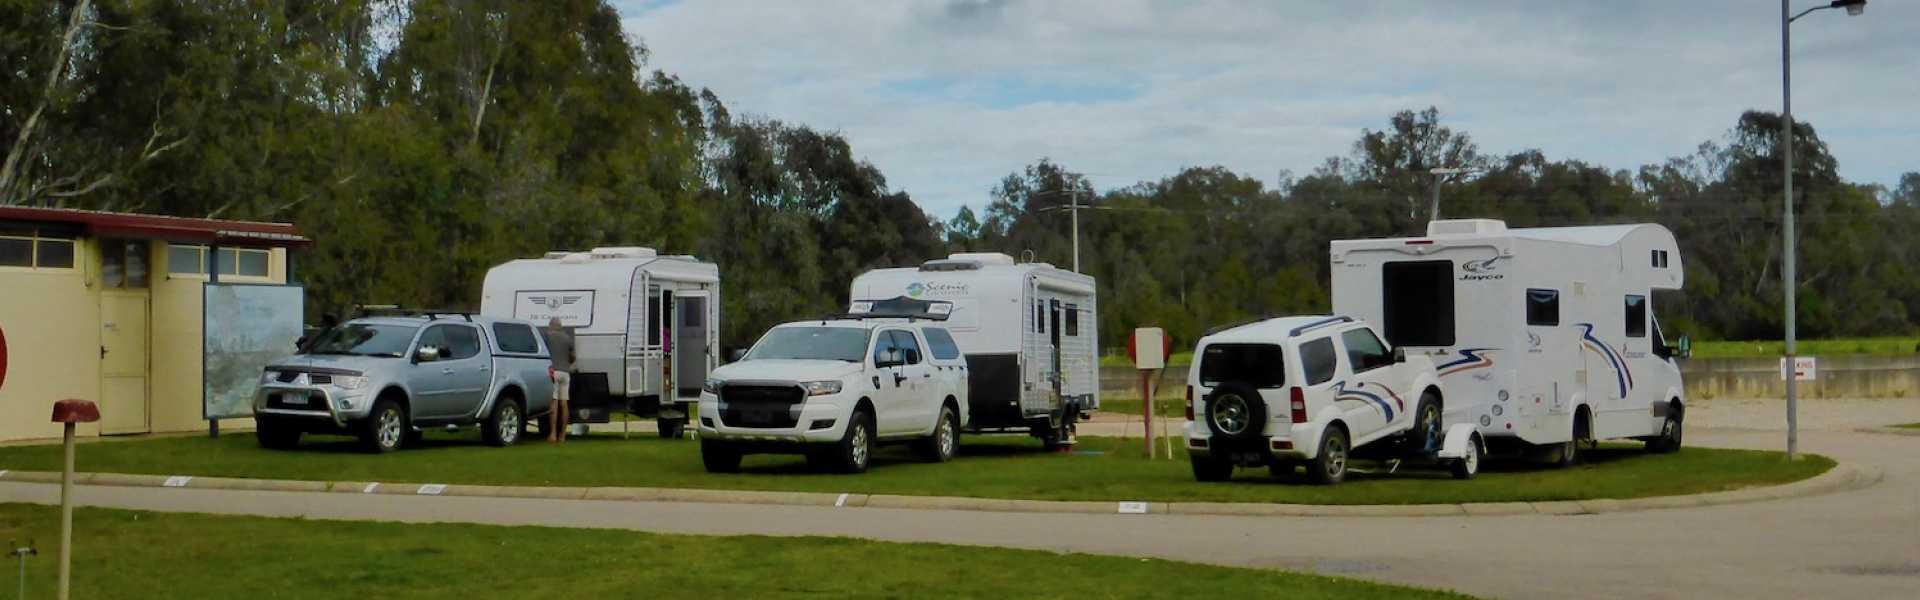 Kui Parks, Wangaratta Caravan Park, Sites